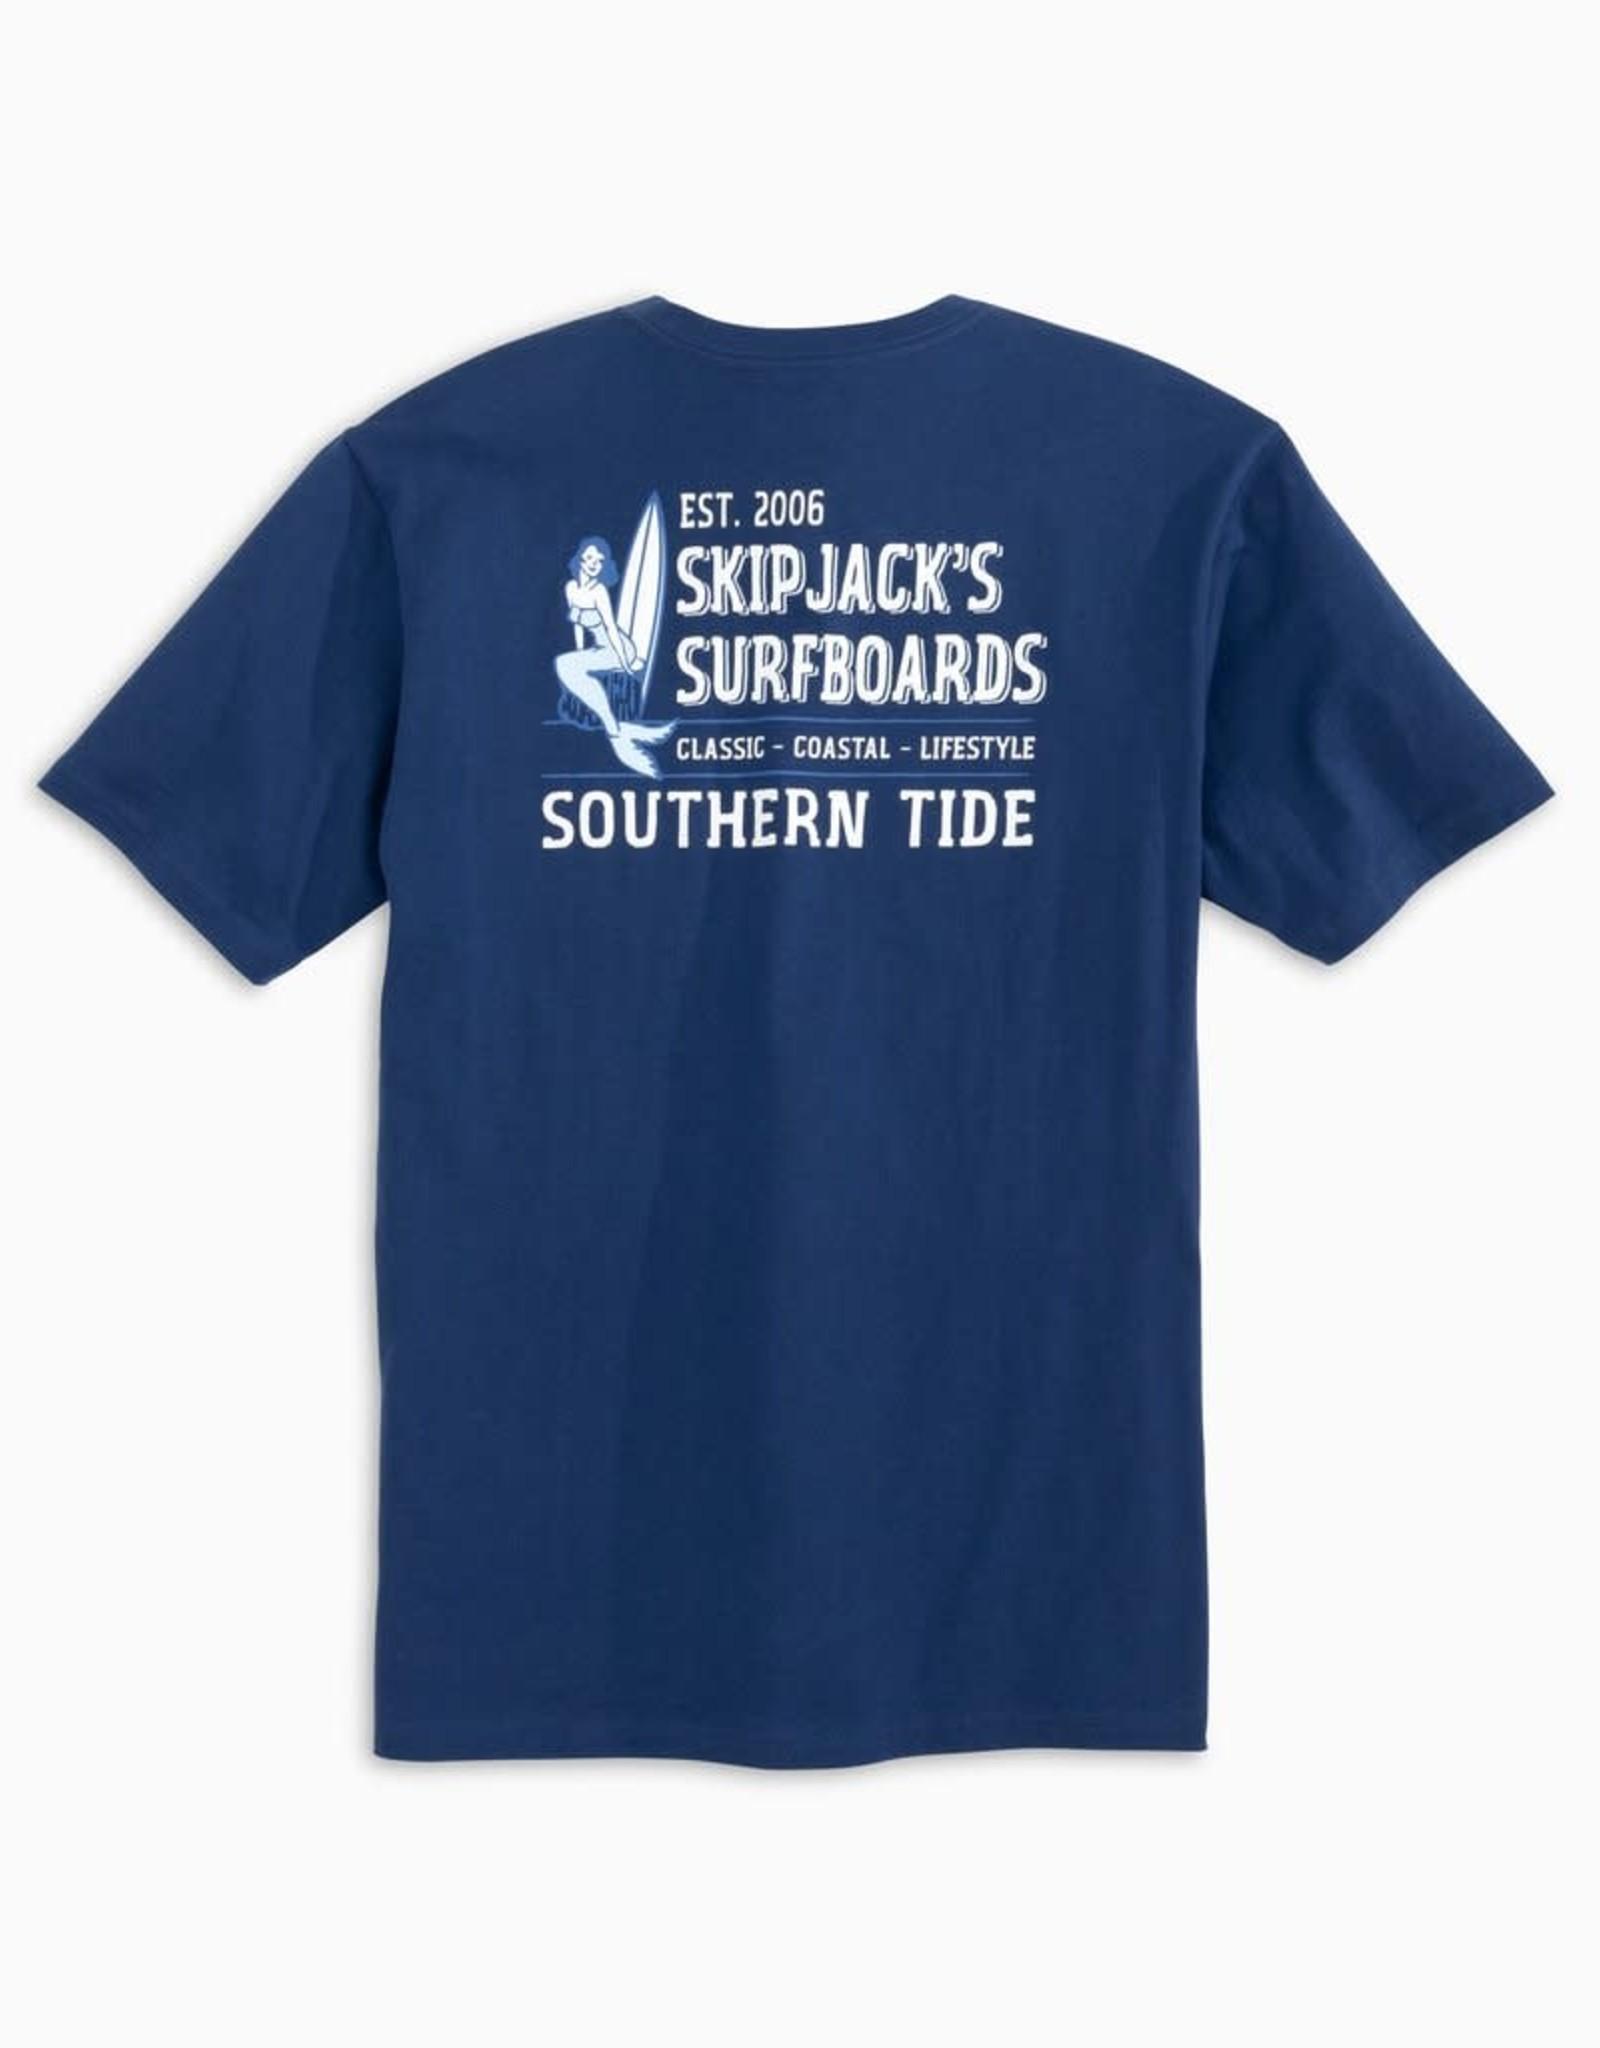 Southern Tide 6290 - Skipjack Surfboards SS Tee